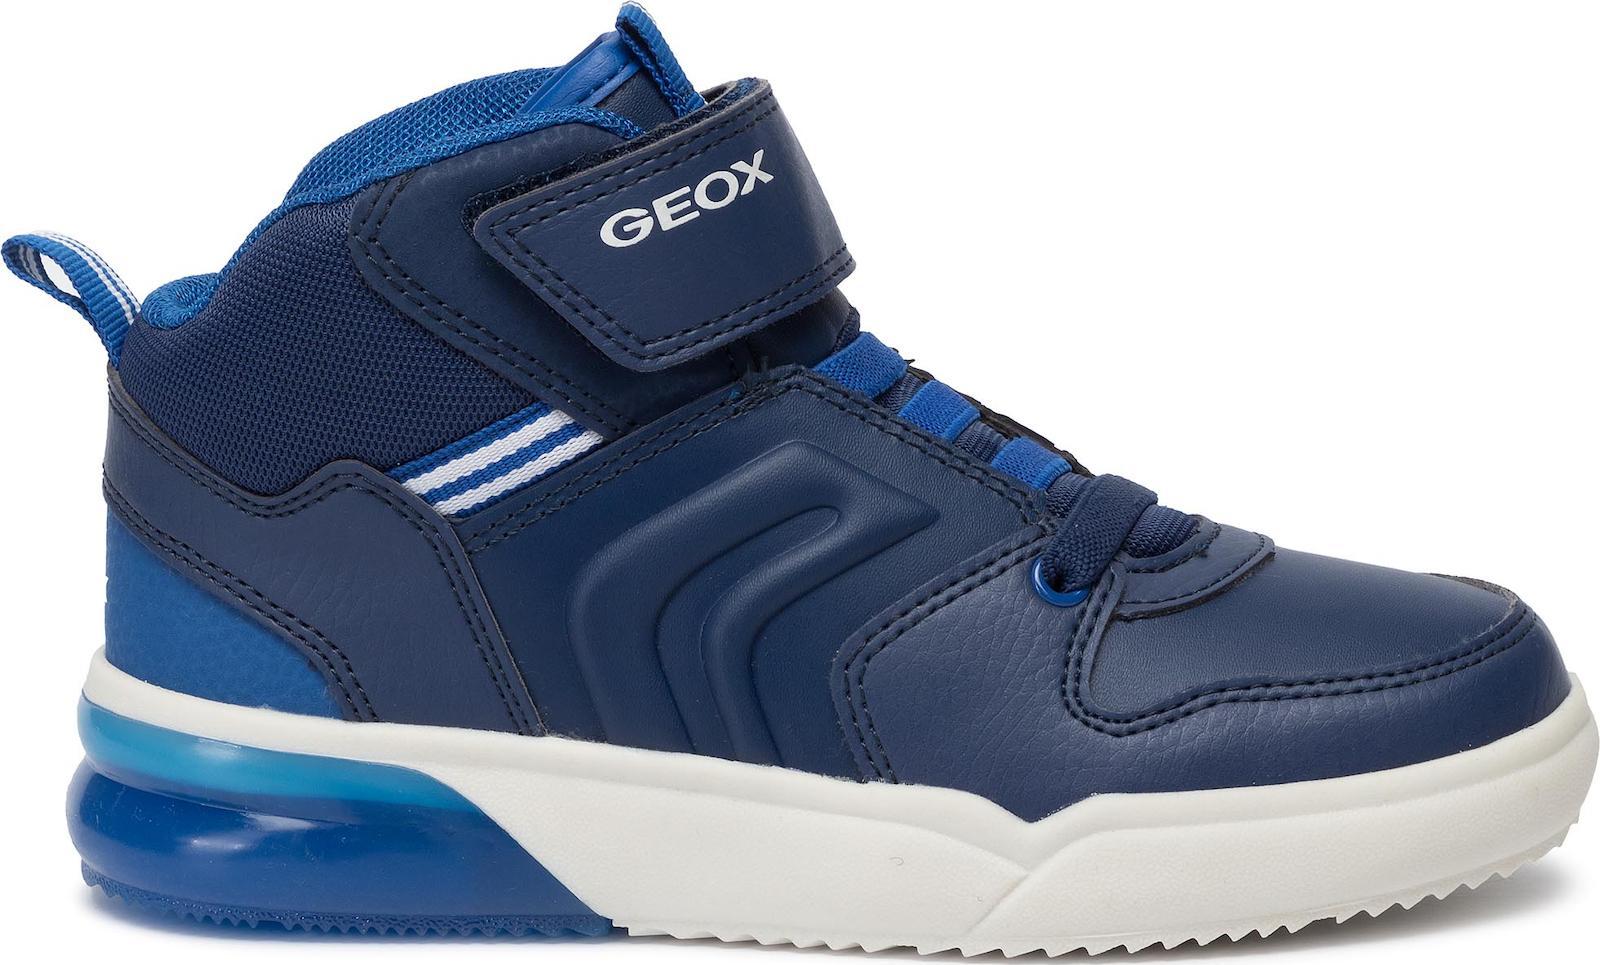 GEOX J Grayjay blue lights